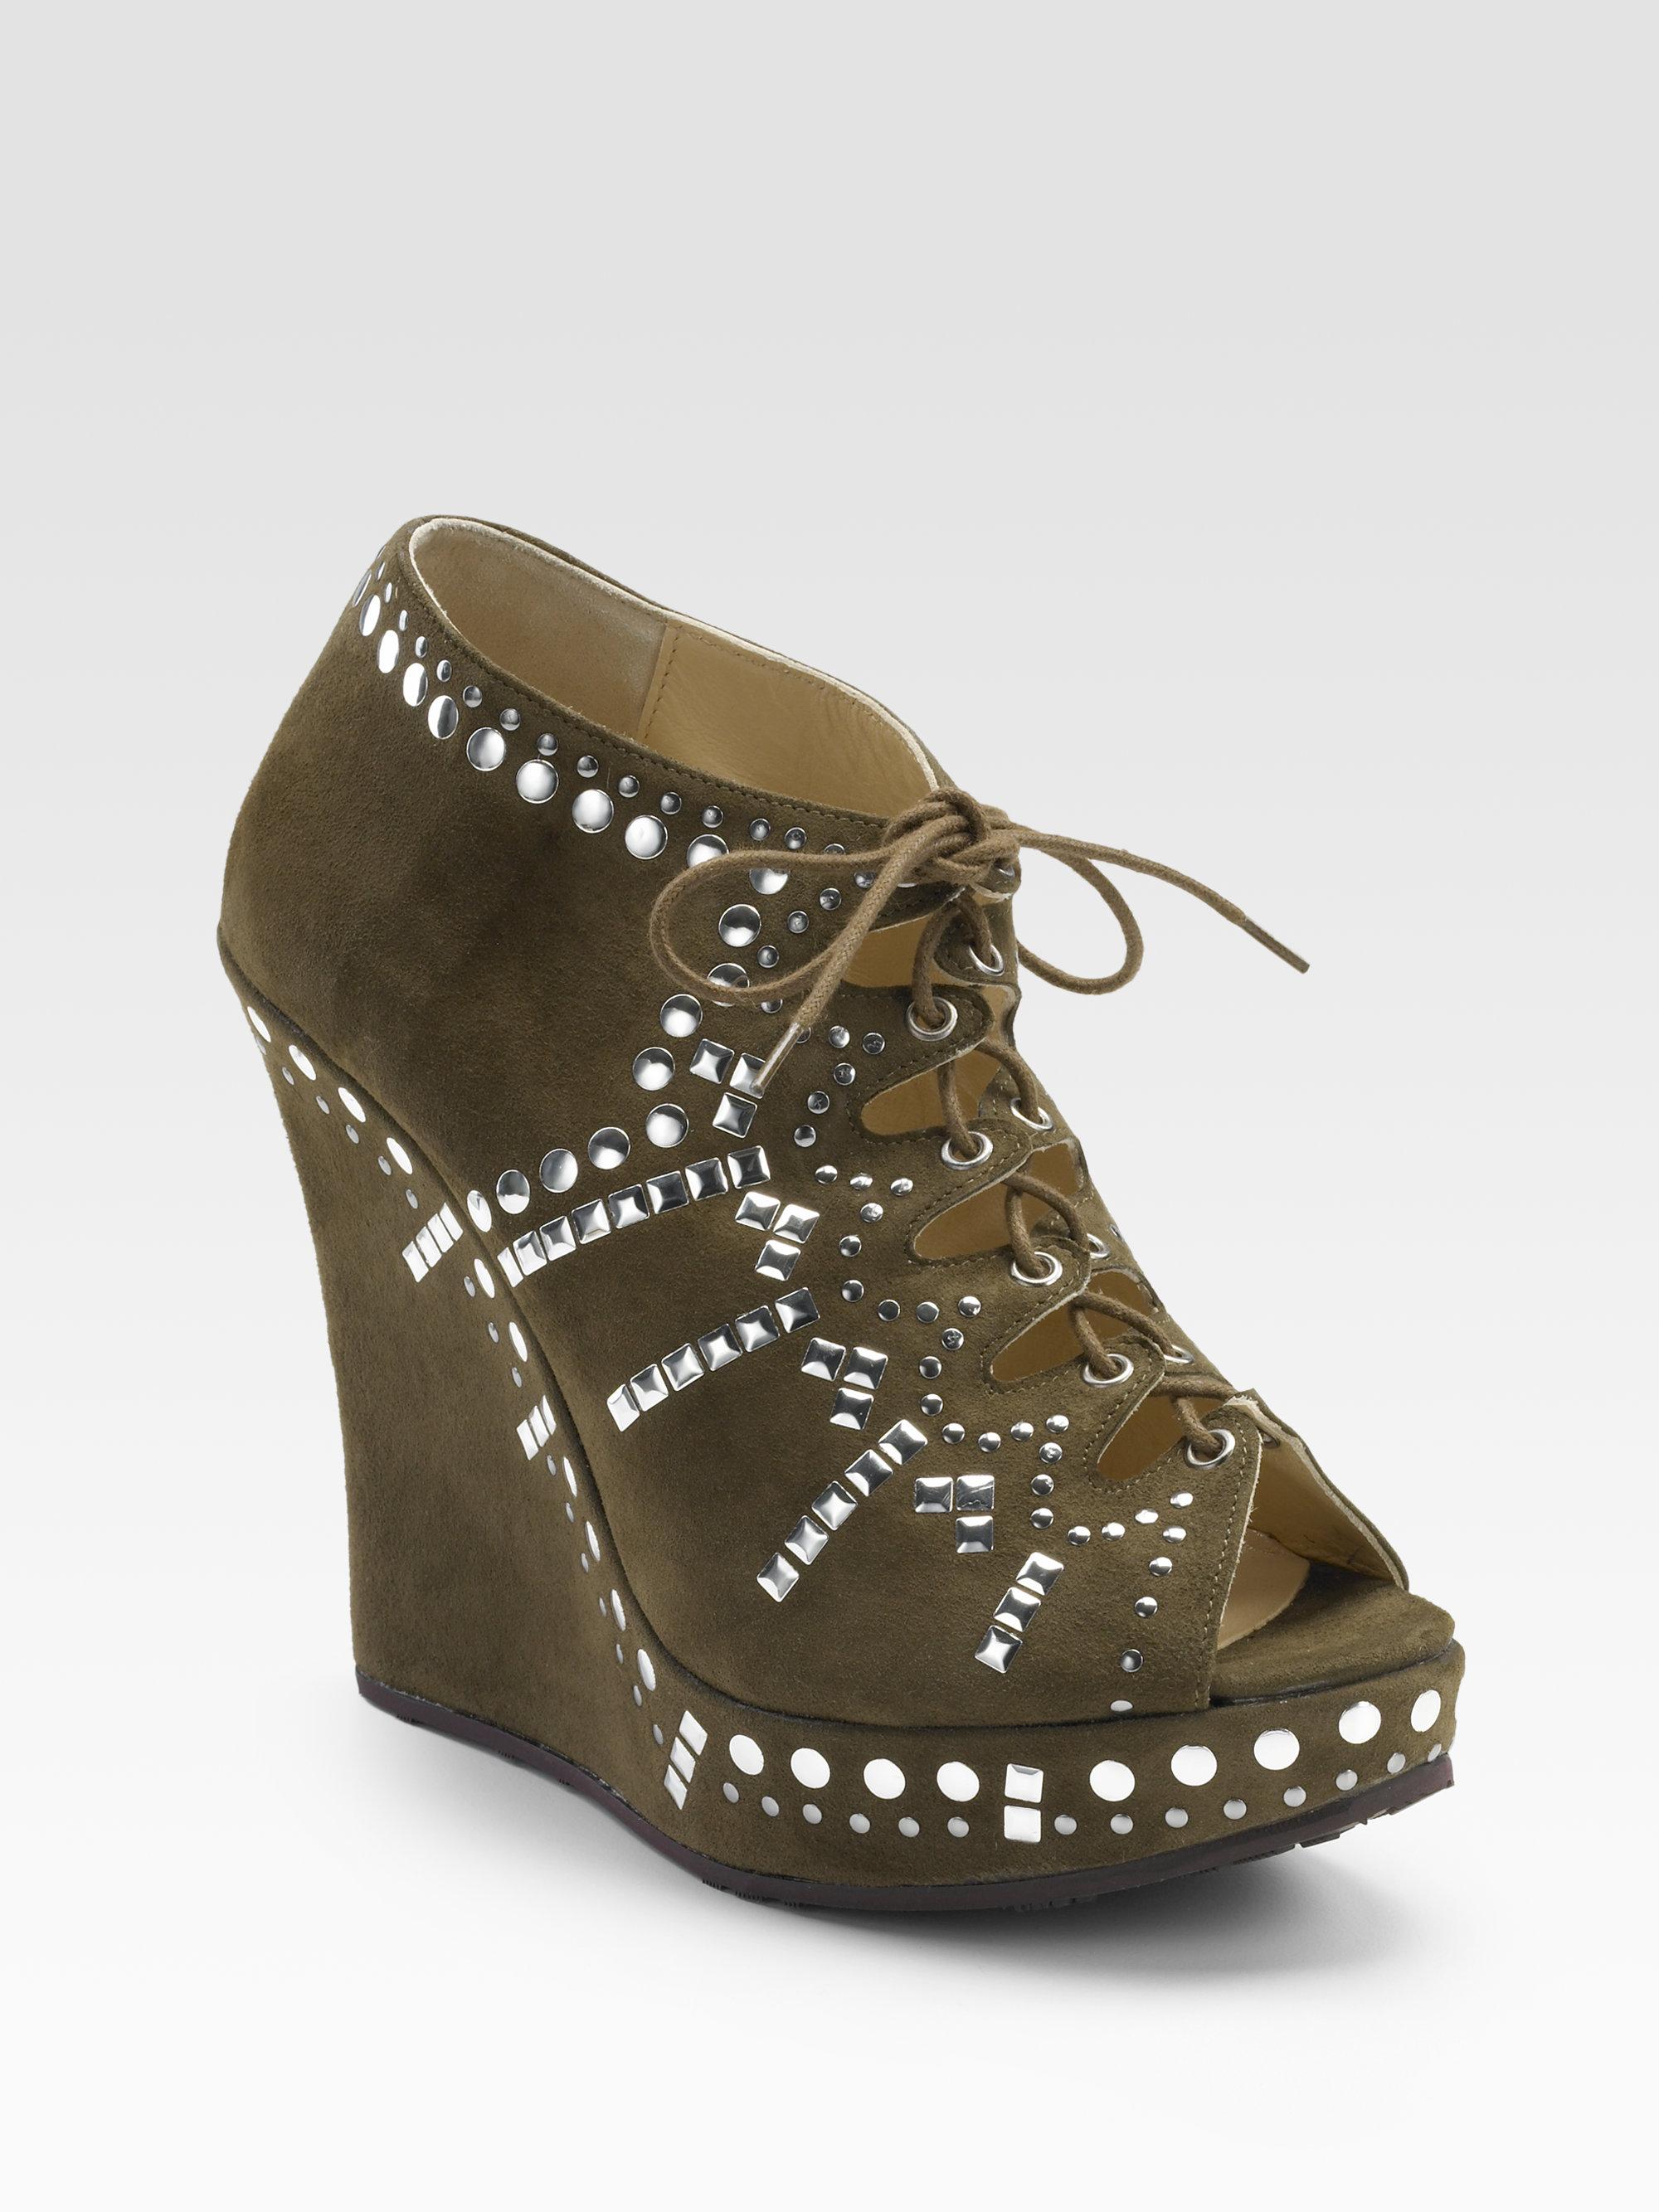 Jimmy Choo Pandora Suede Wedge Sandal Boots In Green